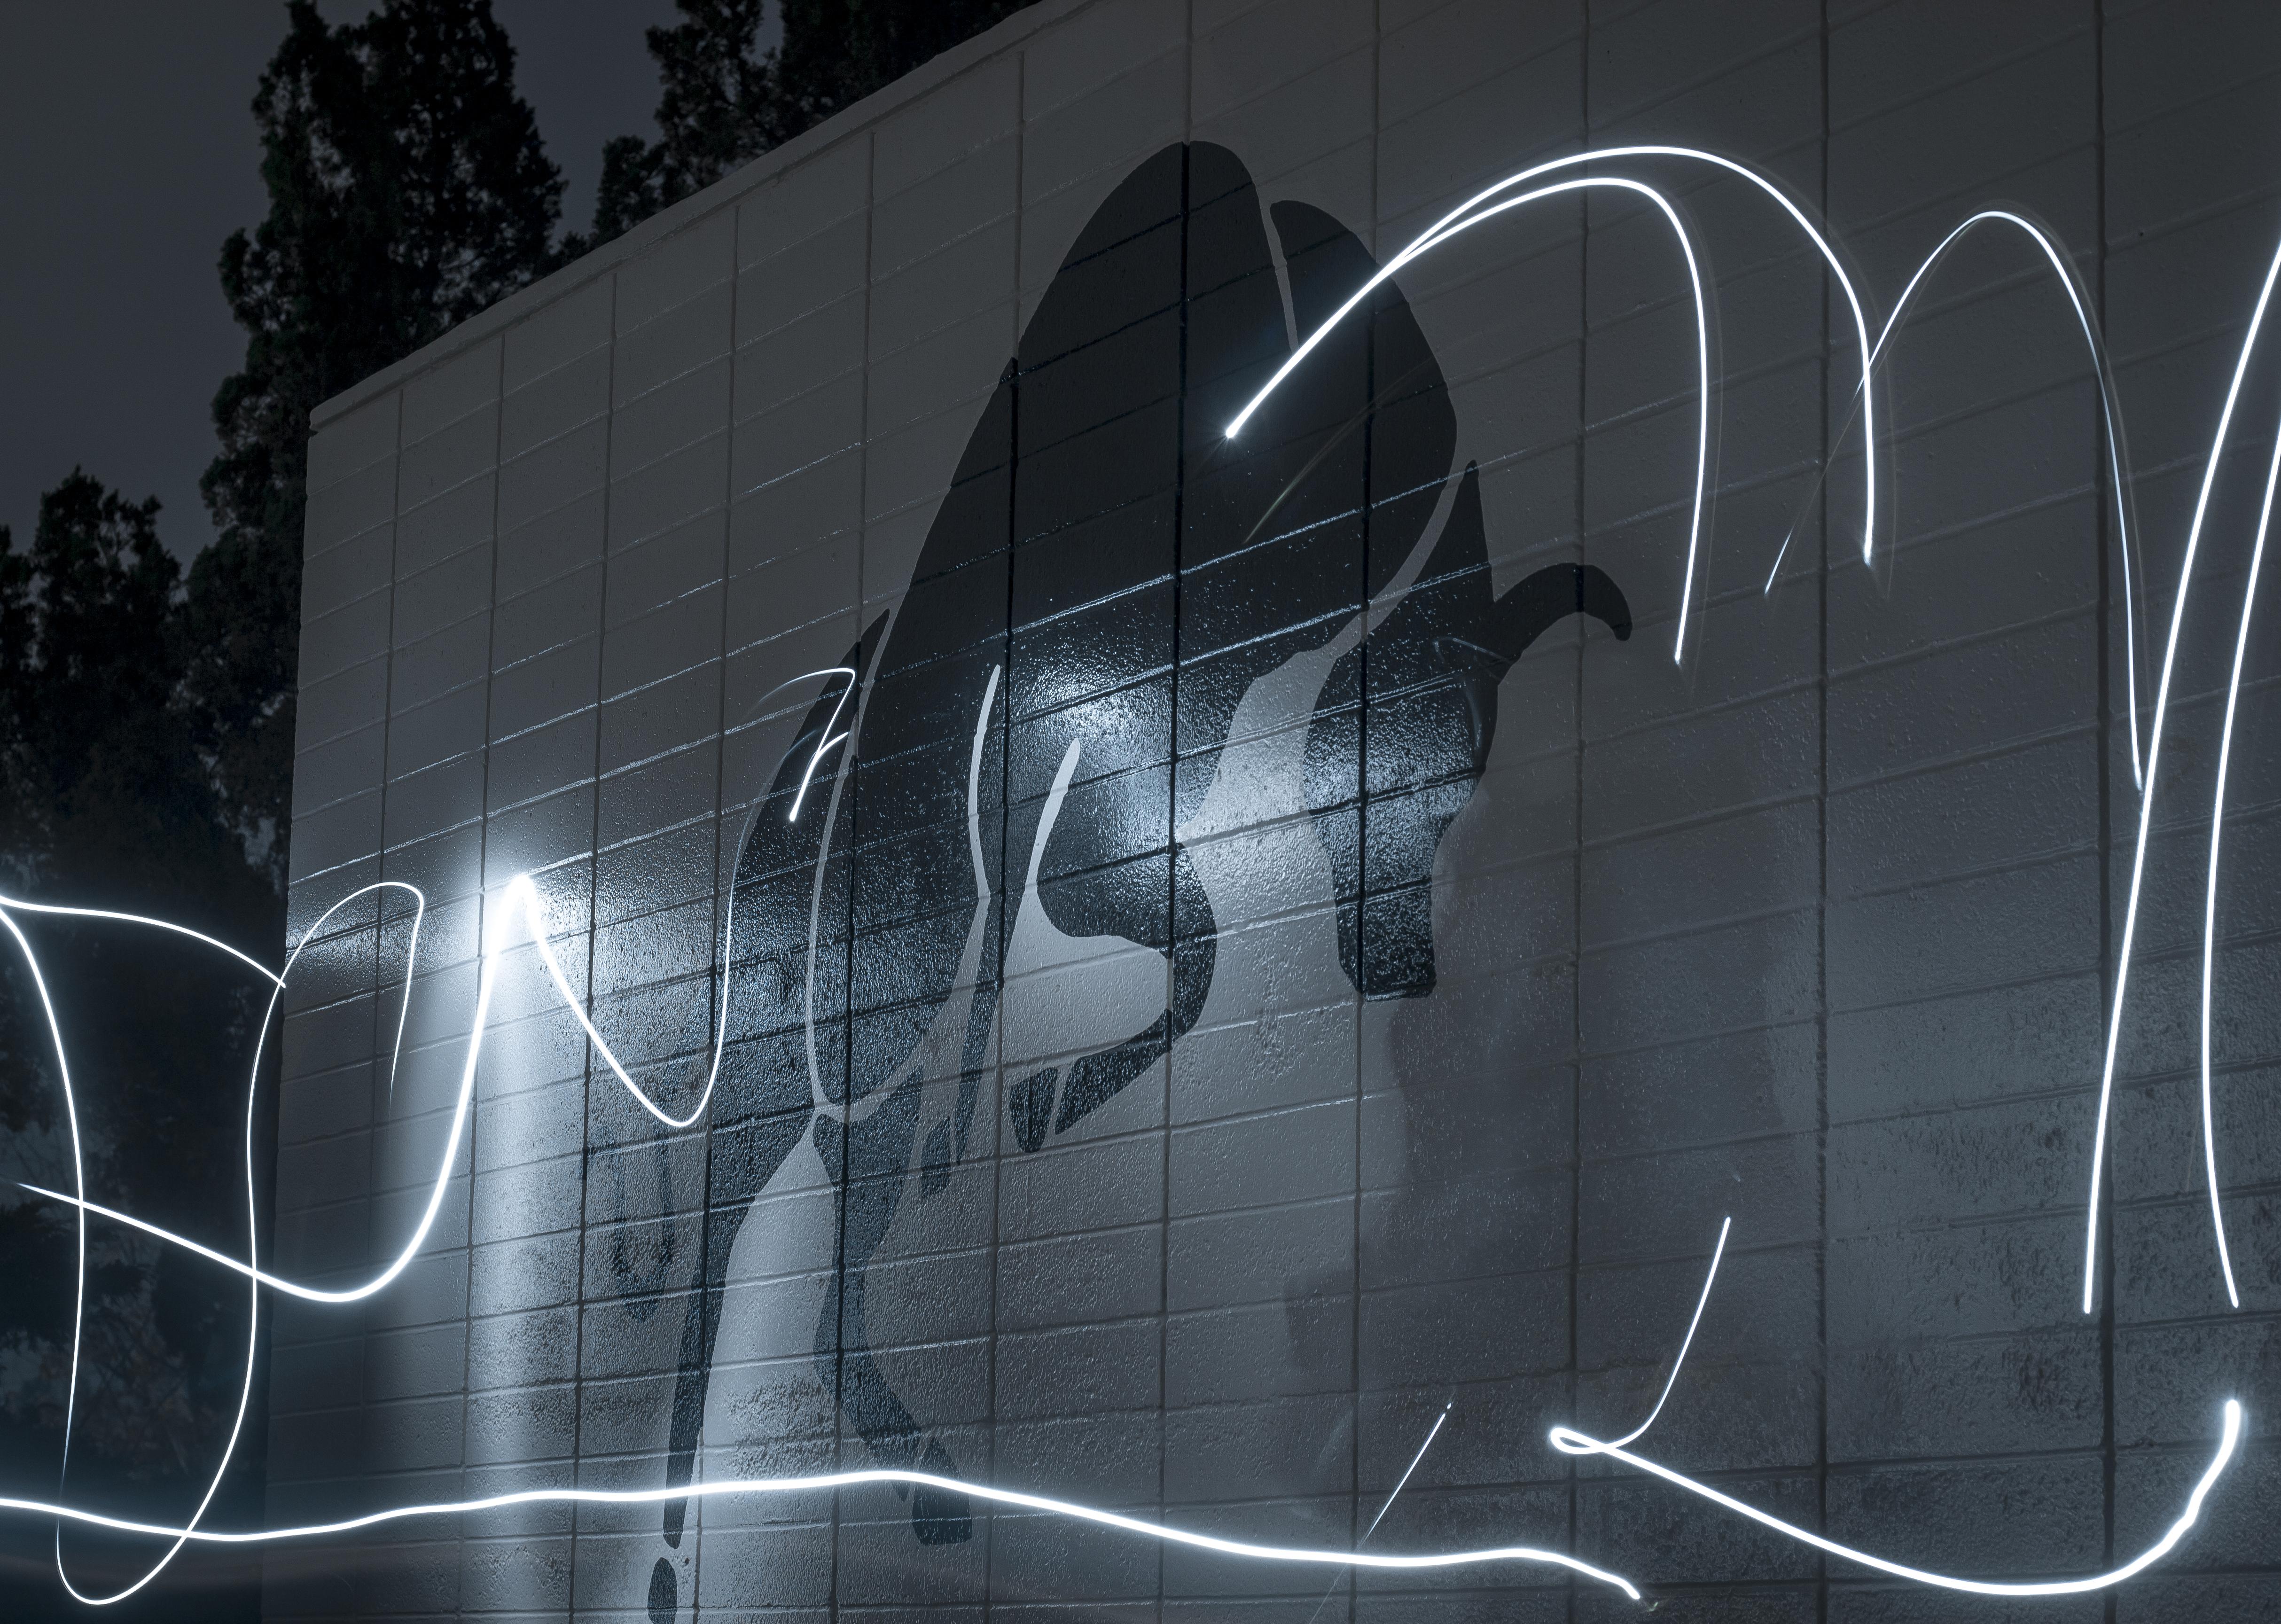 Pierce at night